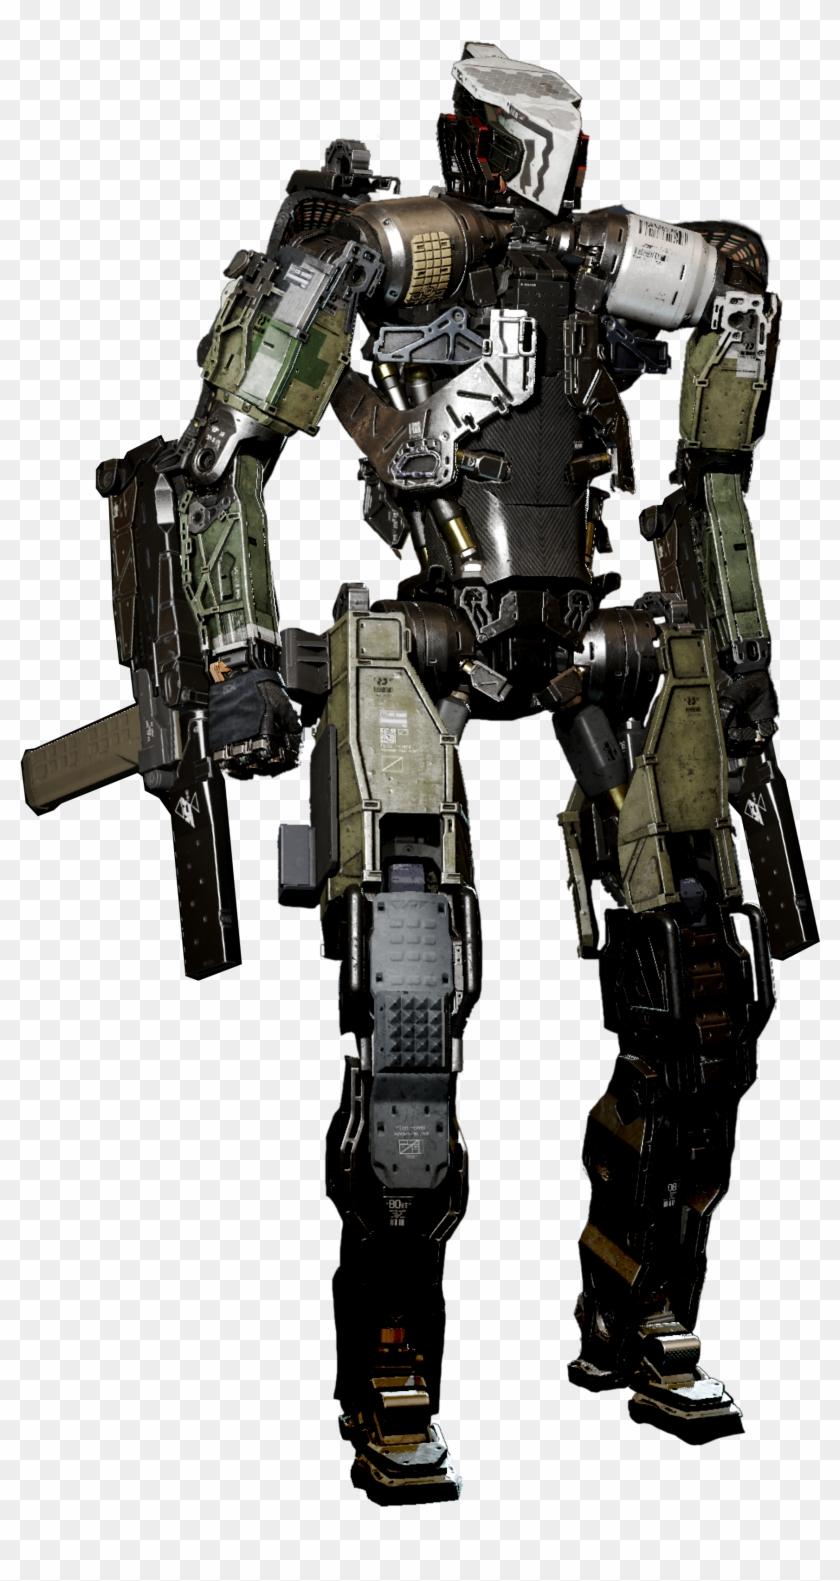 Cod Infinite Warfare Mp Rig Synaptic, HD Png Download.